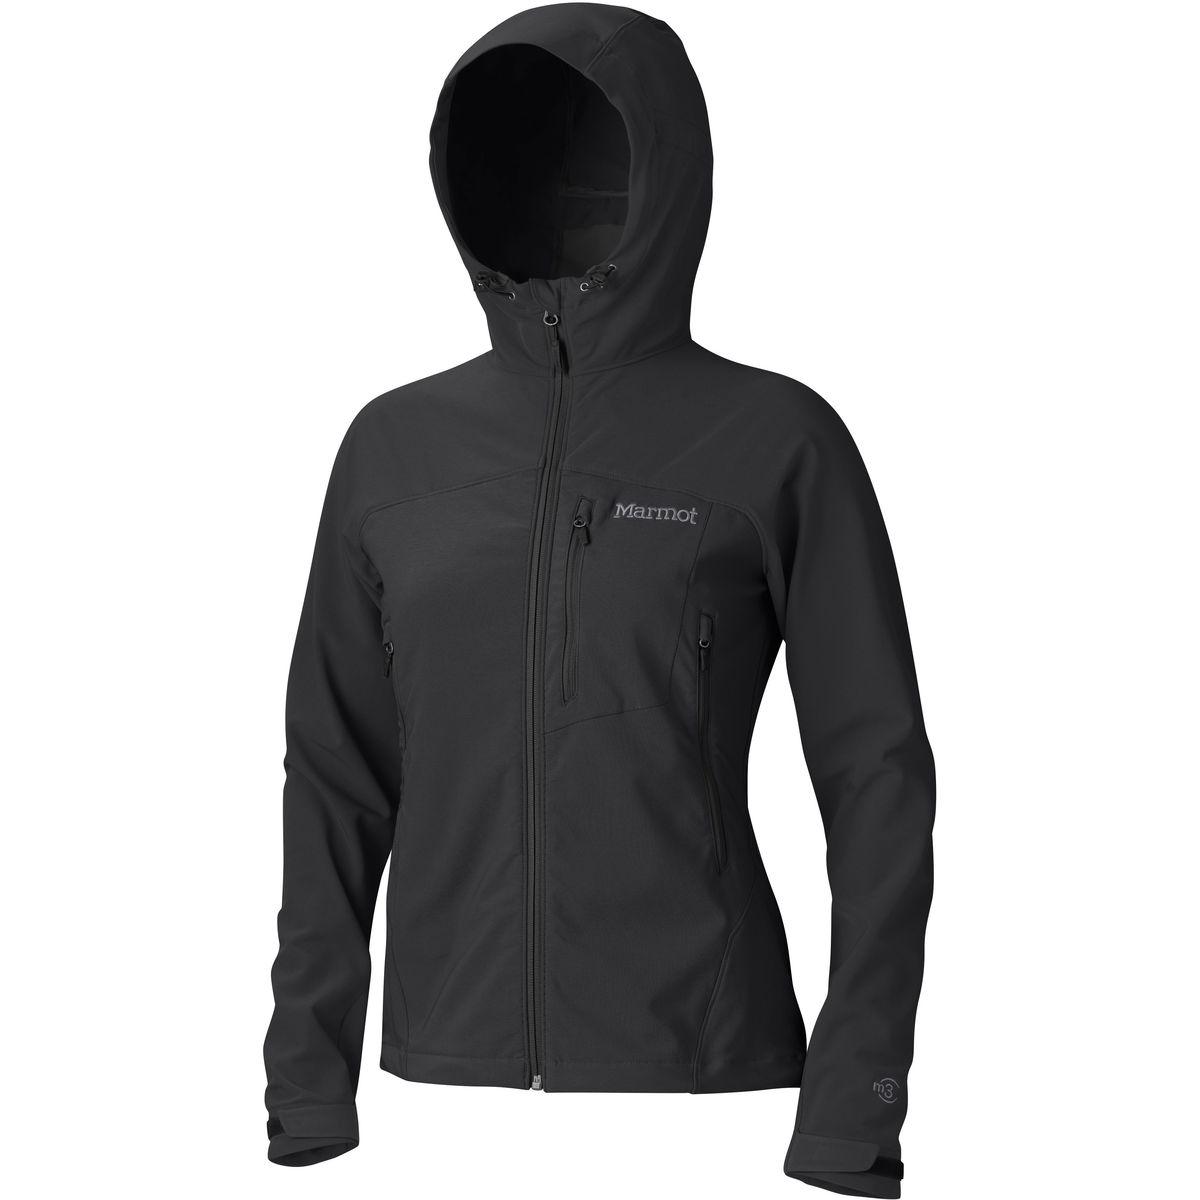 Marmot Estes Hooded Softshell Jacket - Women